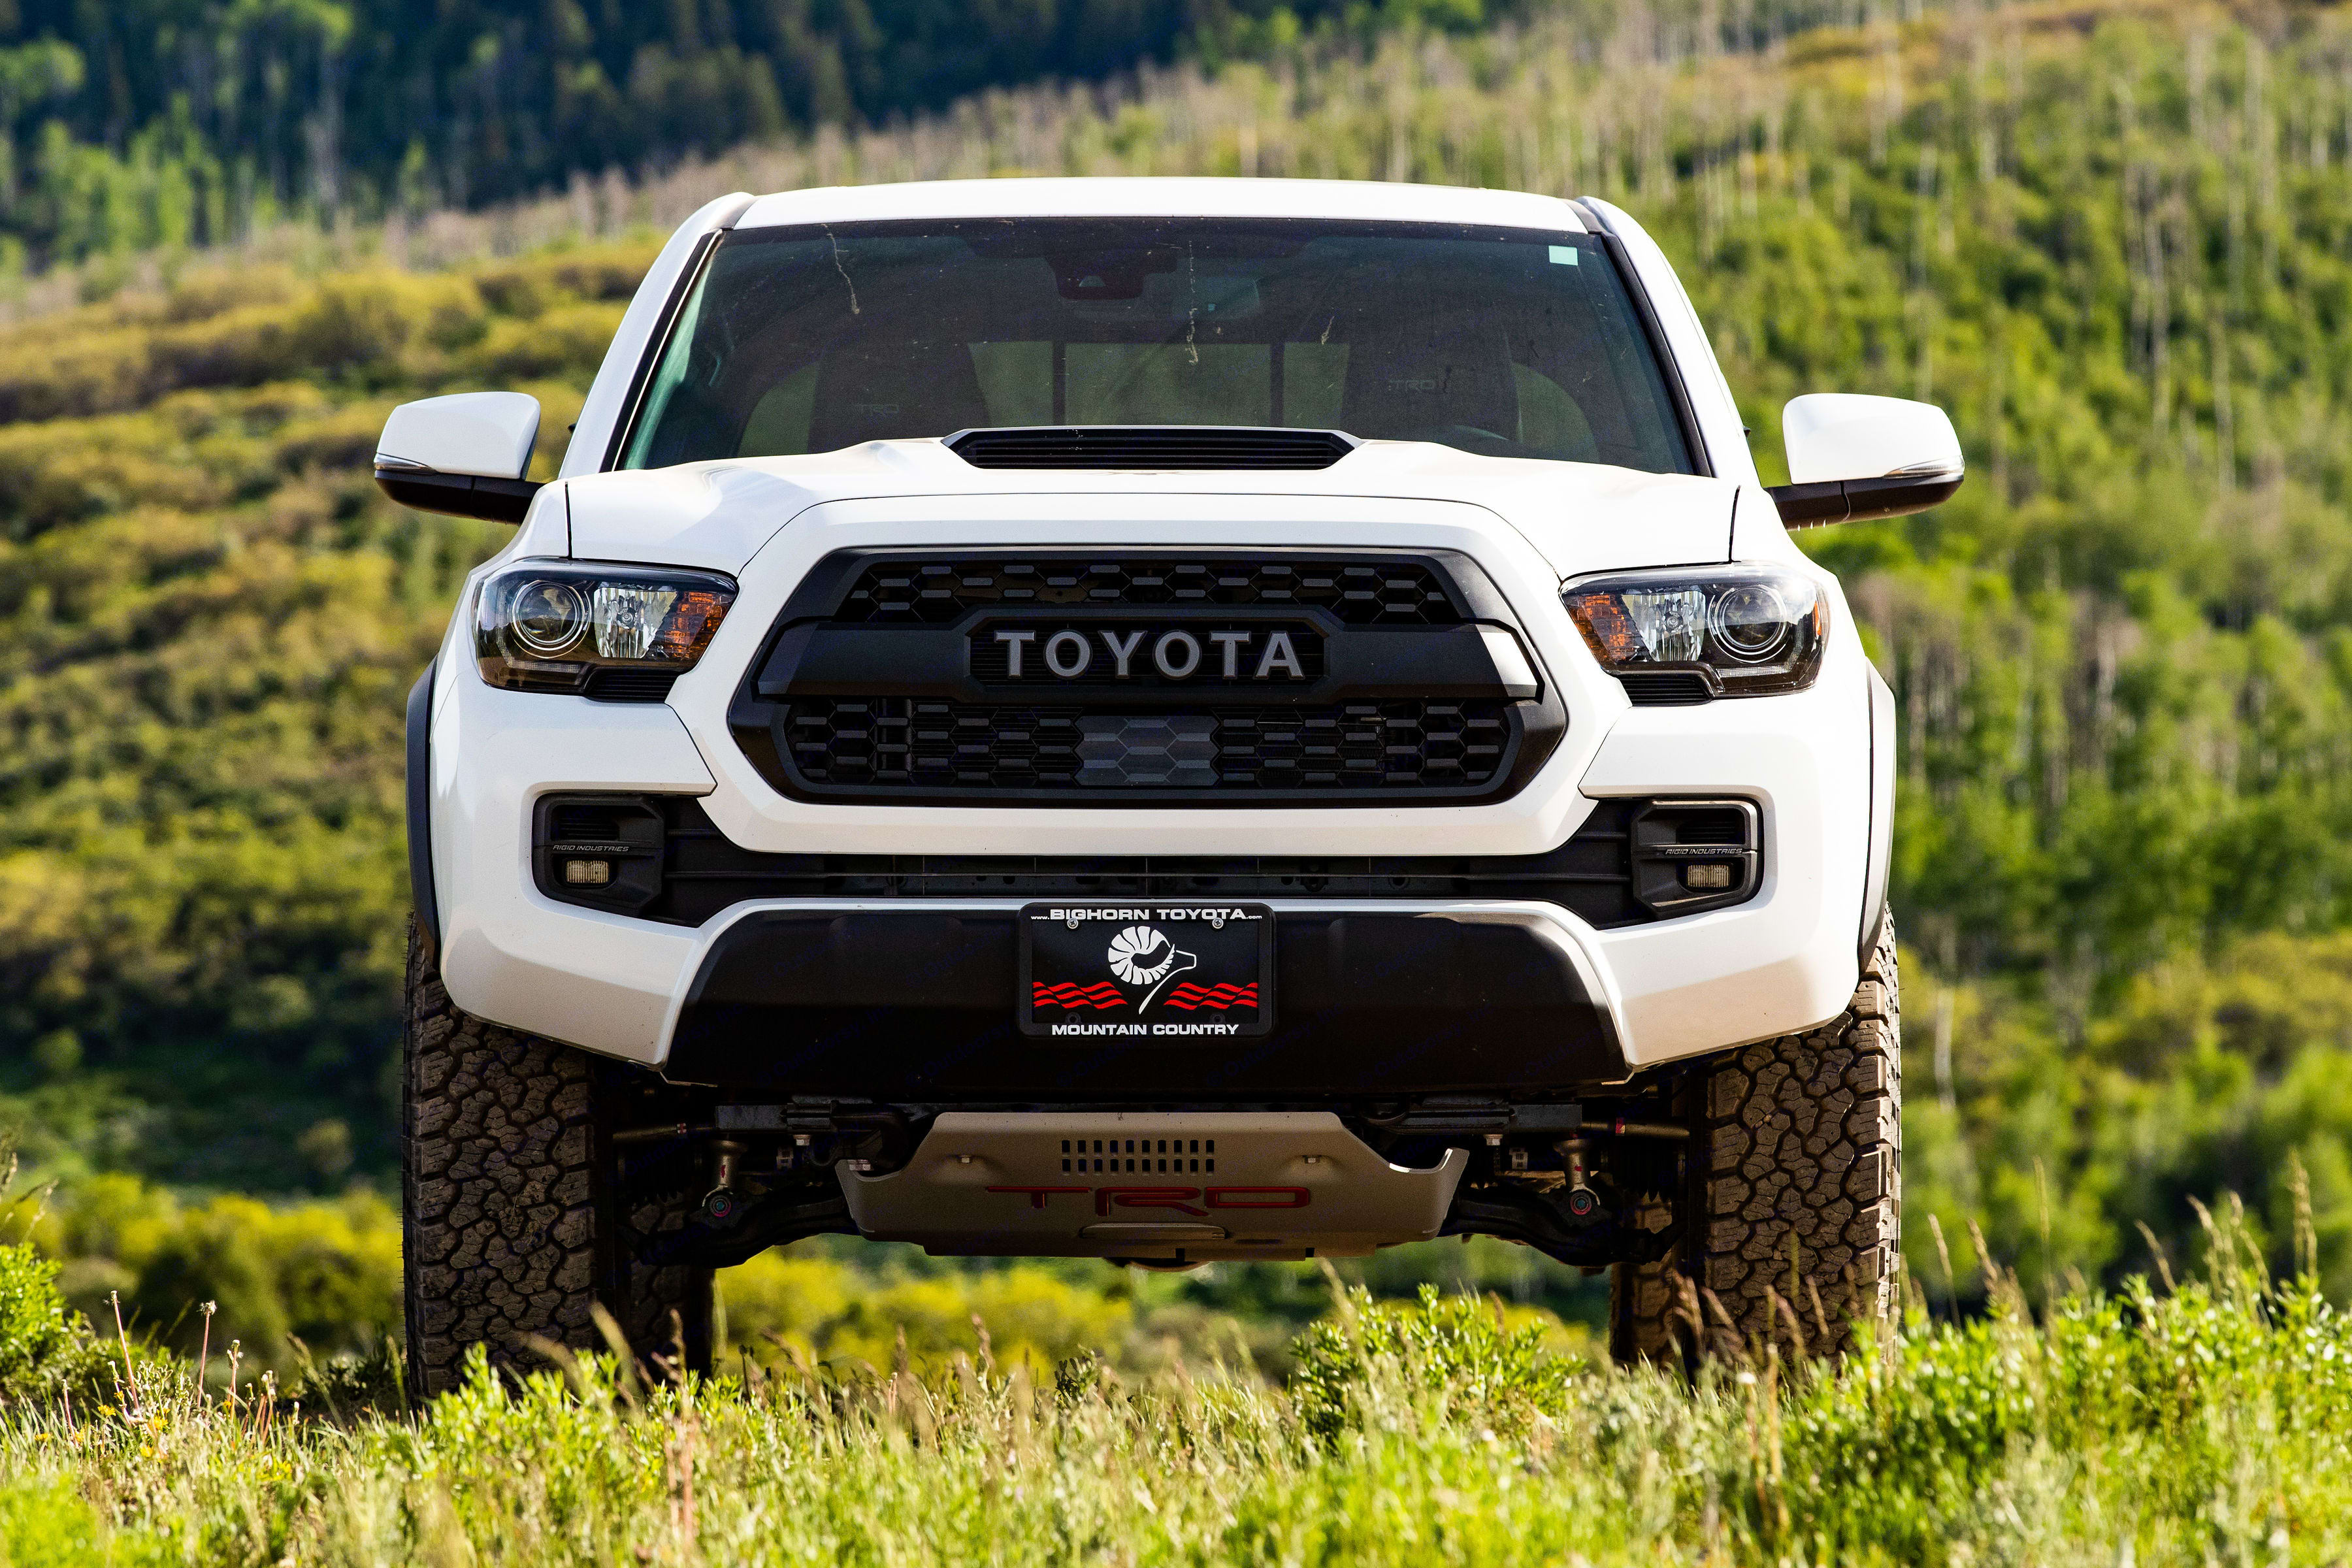 Toyota Tacoma TRD Pro. Toyota Tacoma 2019